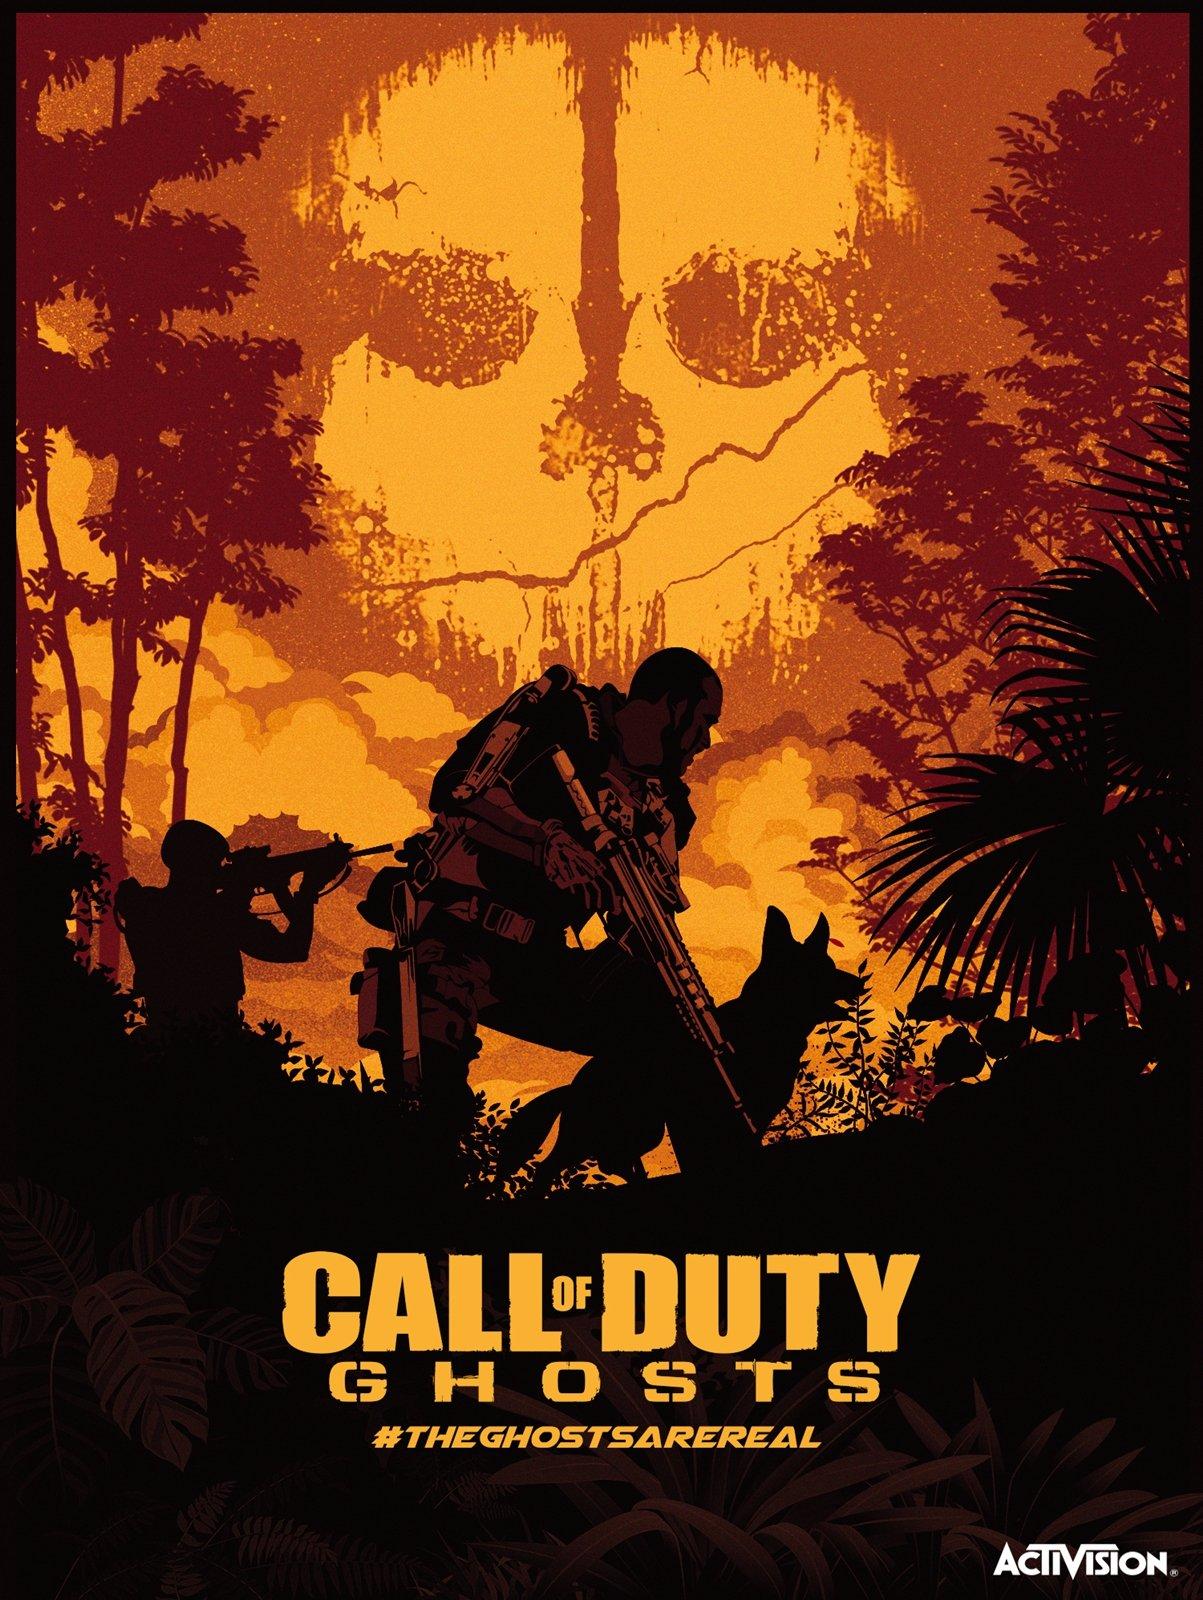 Posterspy Com On Twitter Call Of Duty Ghosts Poster Art Uploaded By Handykara Https T Co 6eprj31fo9